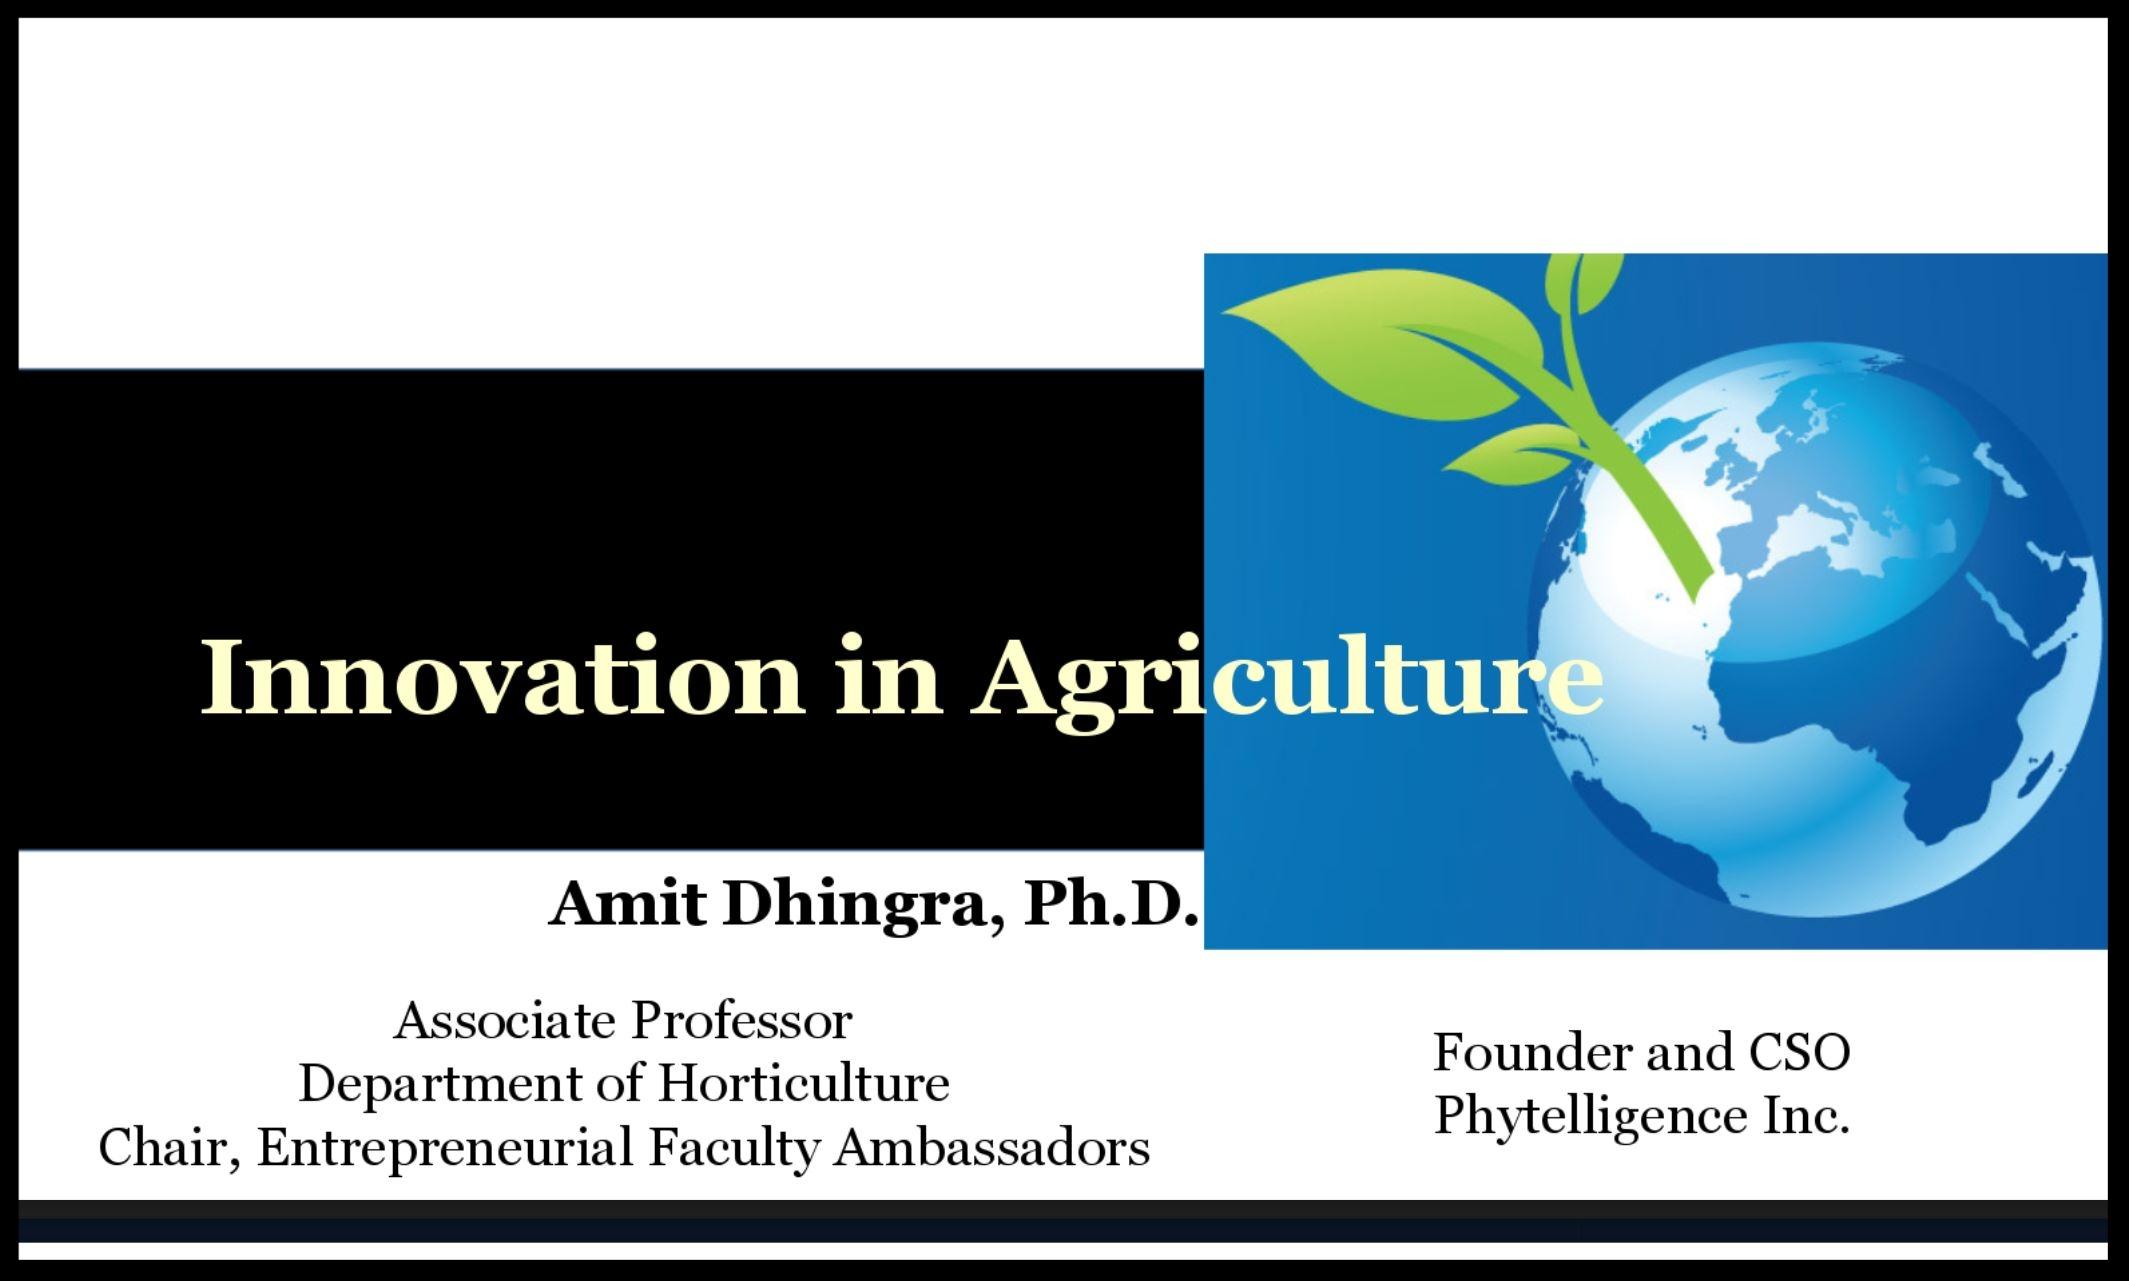 Presenter: Amit Dhingra, Associate Professor, Chair, Entrepreneurial Faculty Ambassadors Program at WSU; Founder & CSO, Phytelligence